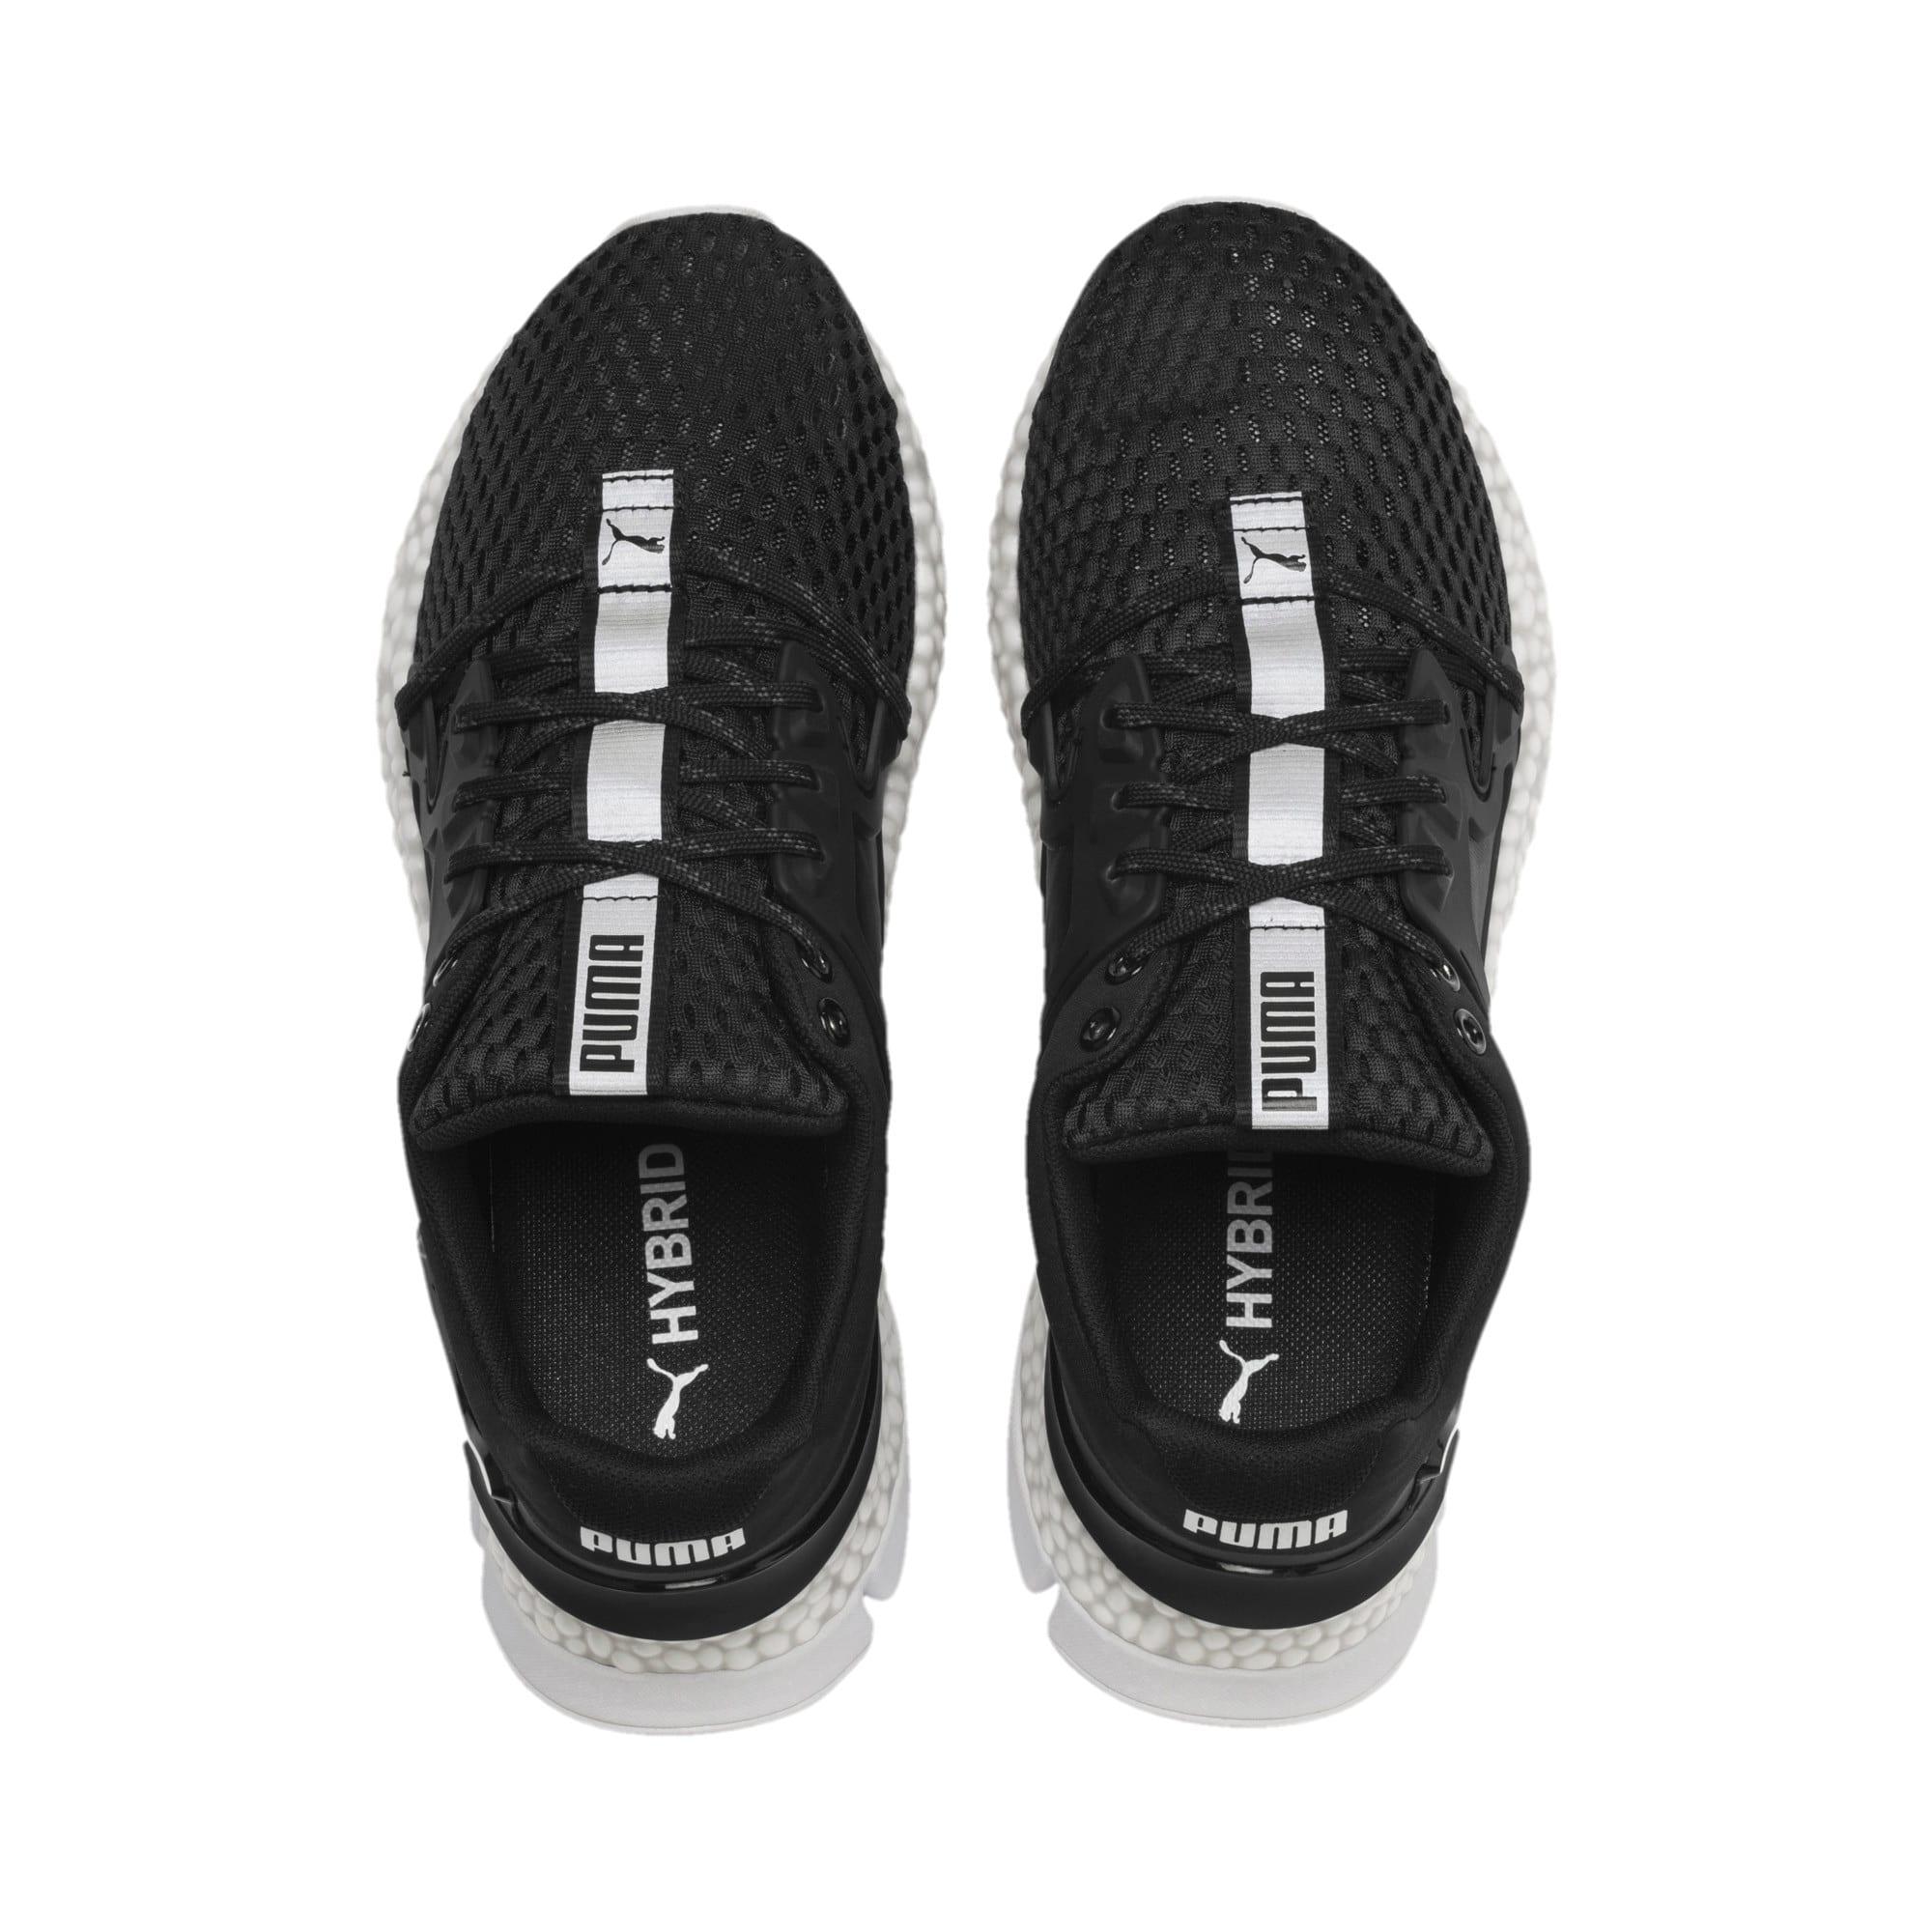 Thumbnail 8 of HYBRID Sky Women's Running Shoes, Puma Black-Puma White, medium